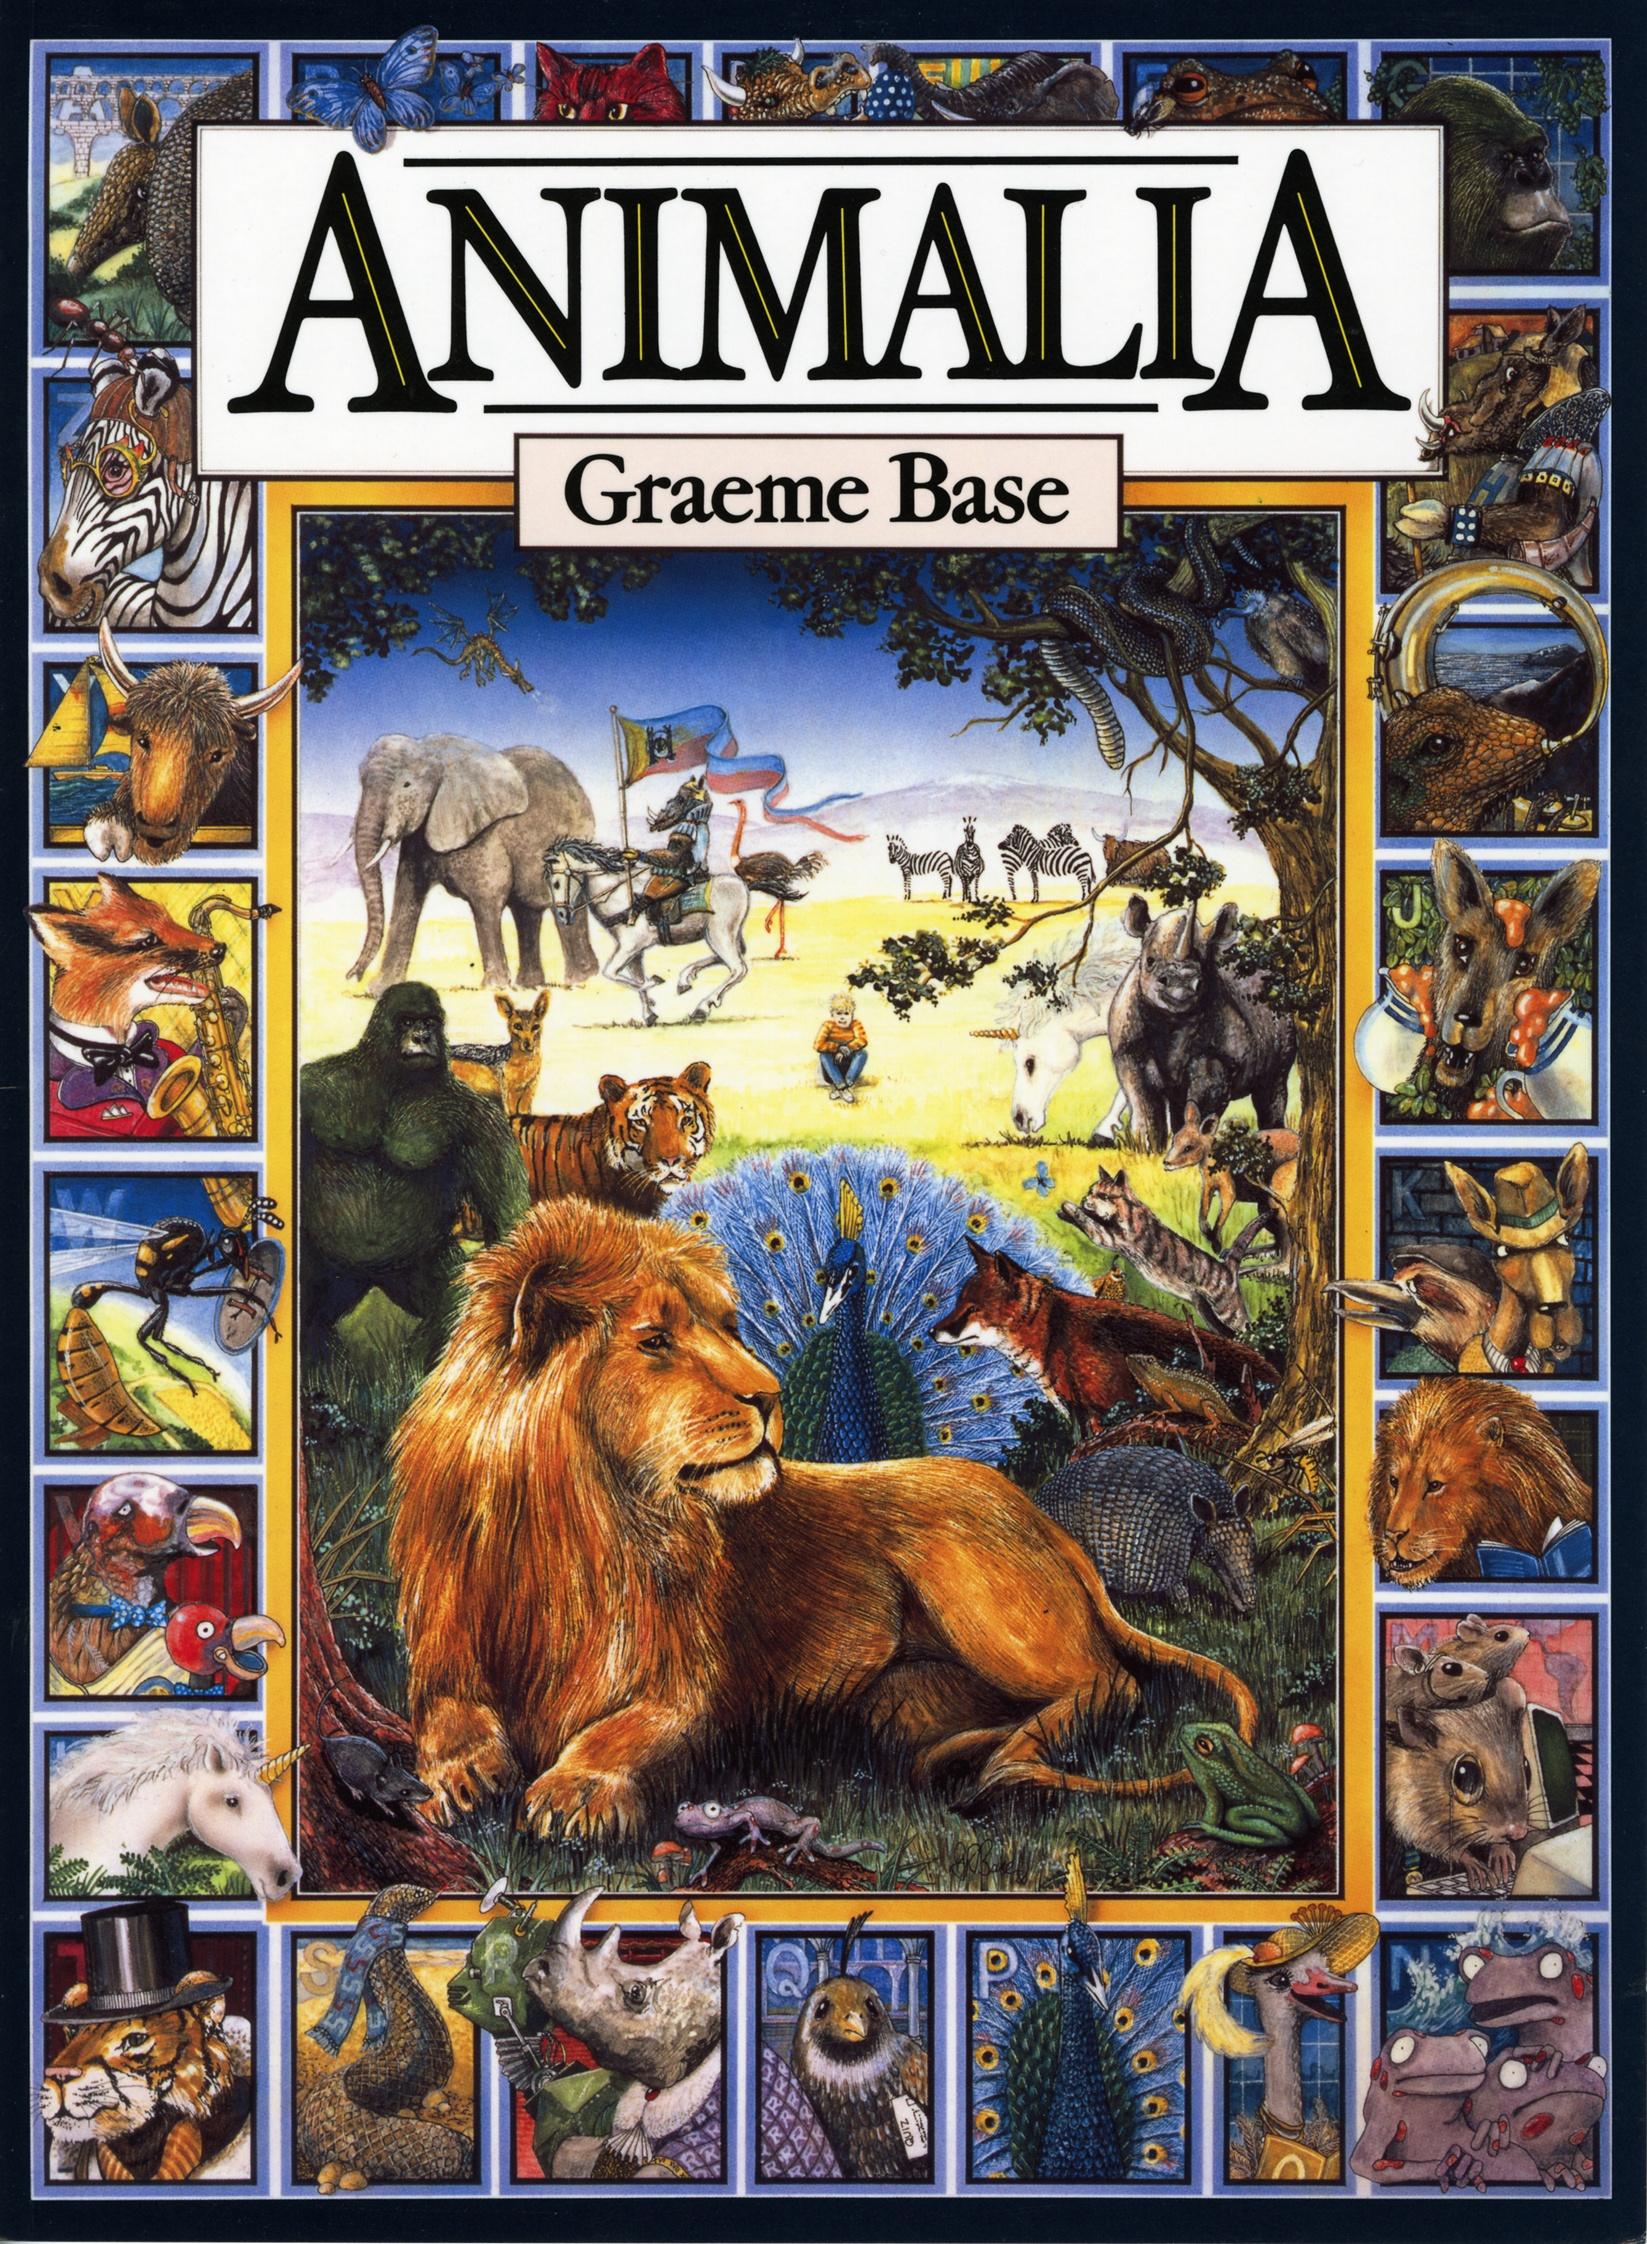 Children S Book Covers Alan Powers ~ Animalia children s books wiki fandom powered by wikia